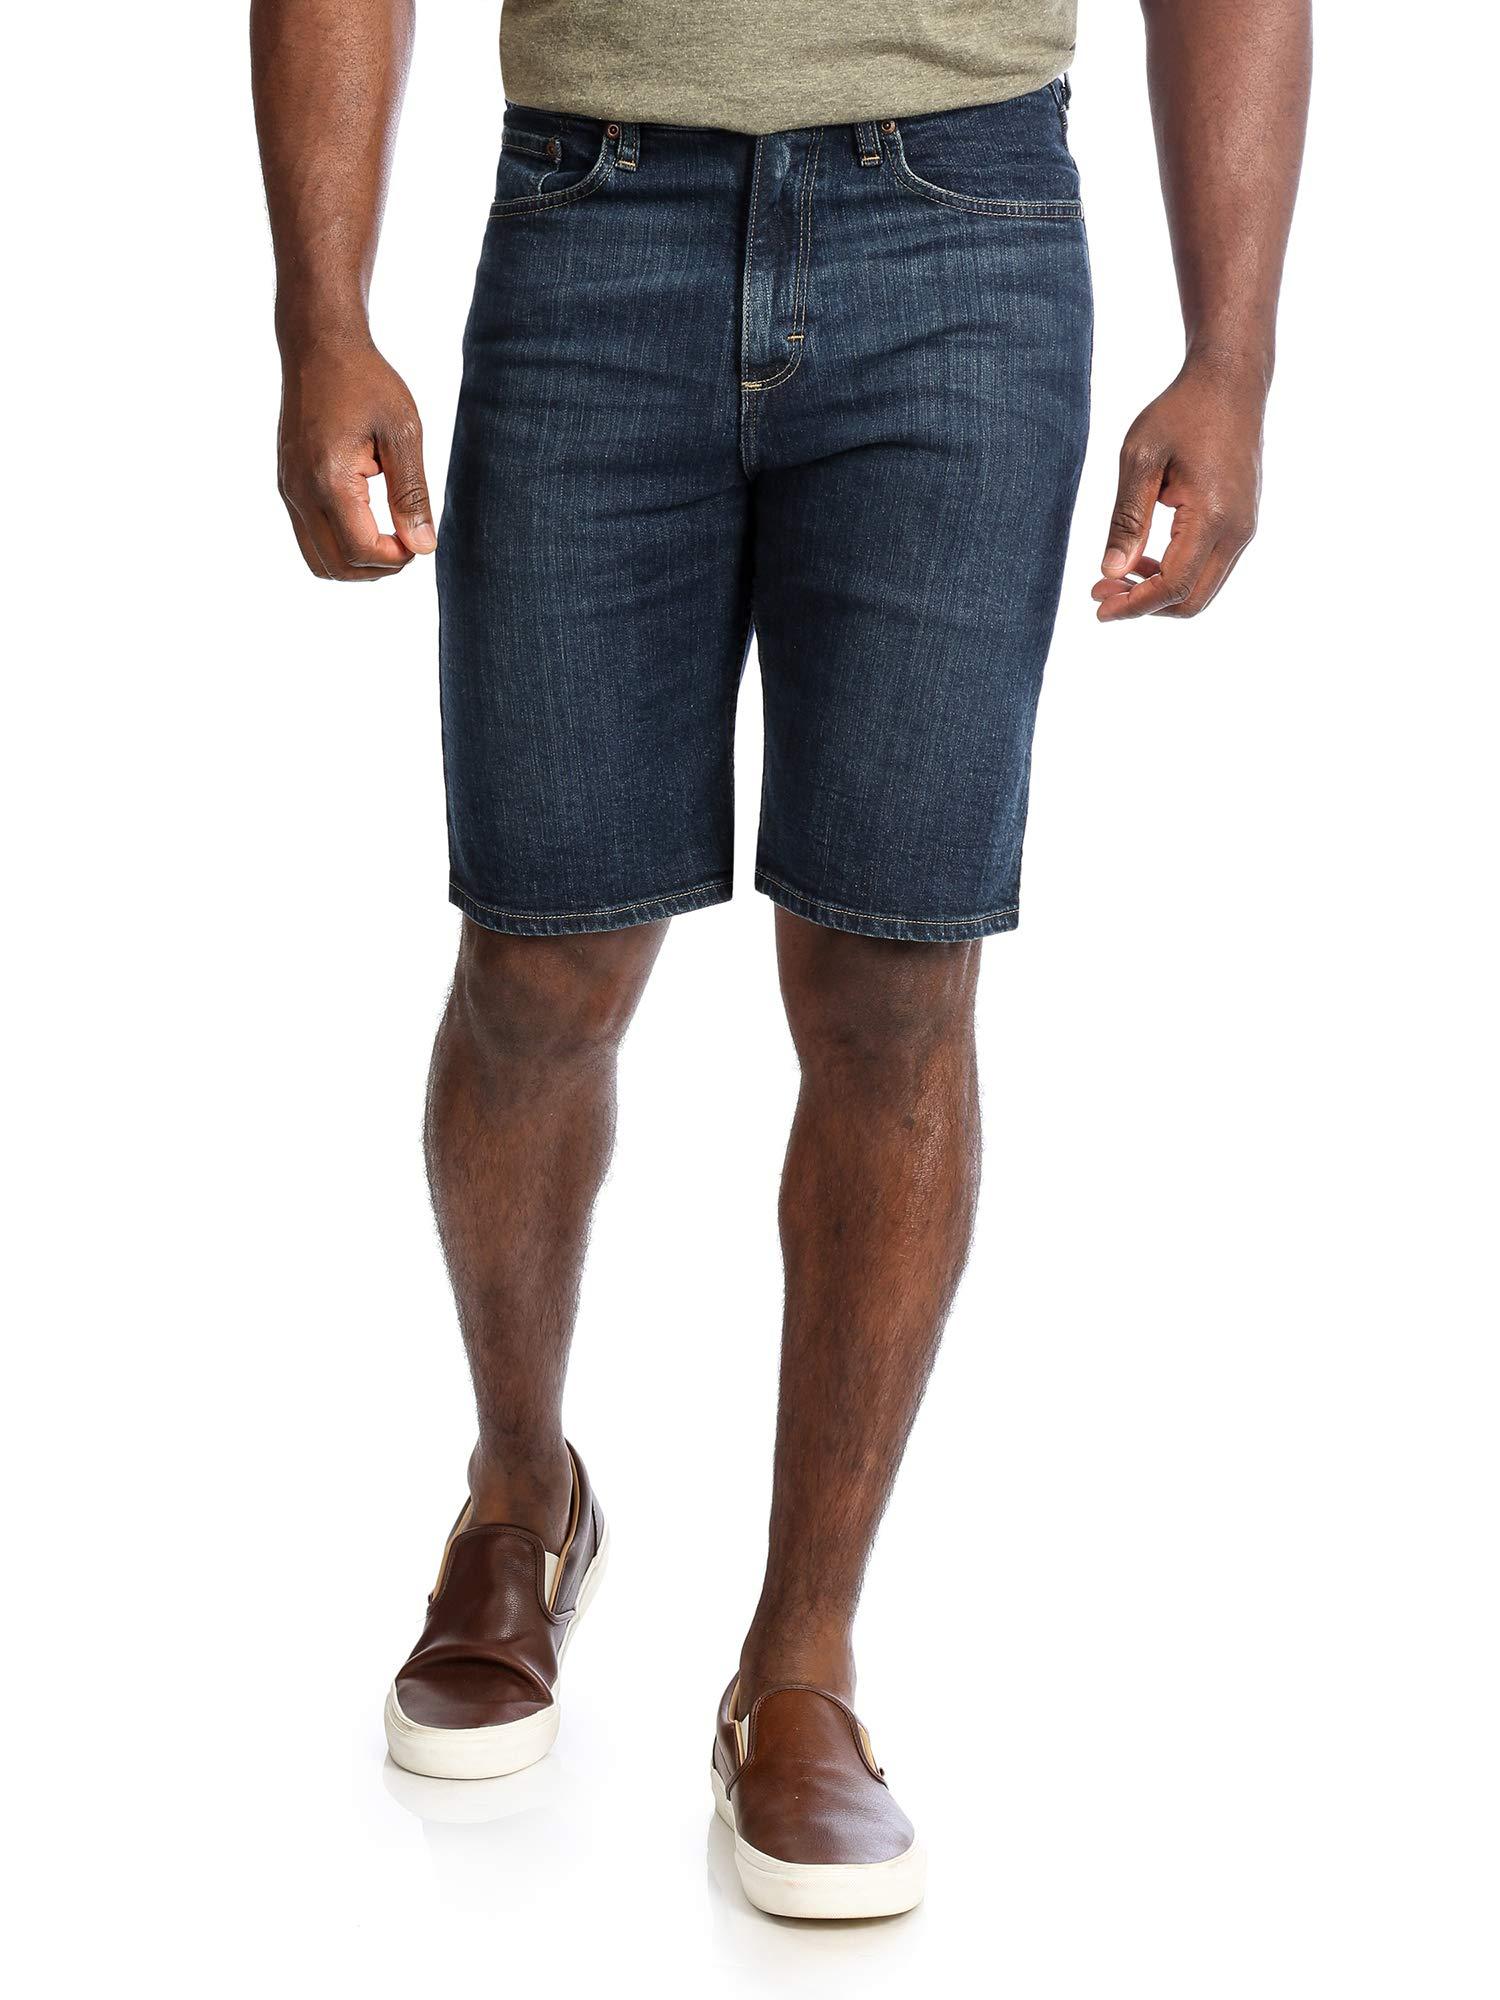 Wrangler Authentics Men's Big and Tall Big & Tall Comfort Flex Denim Short, Dark, 46